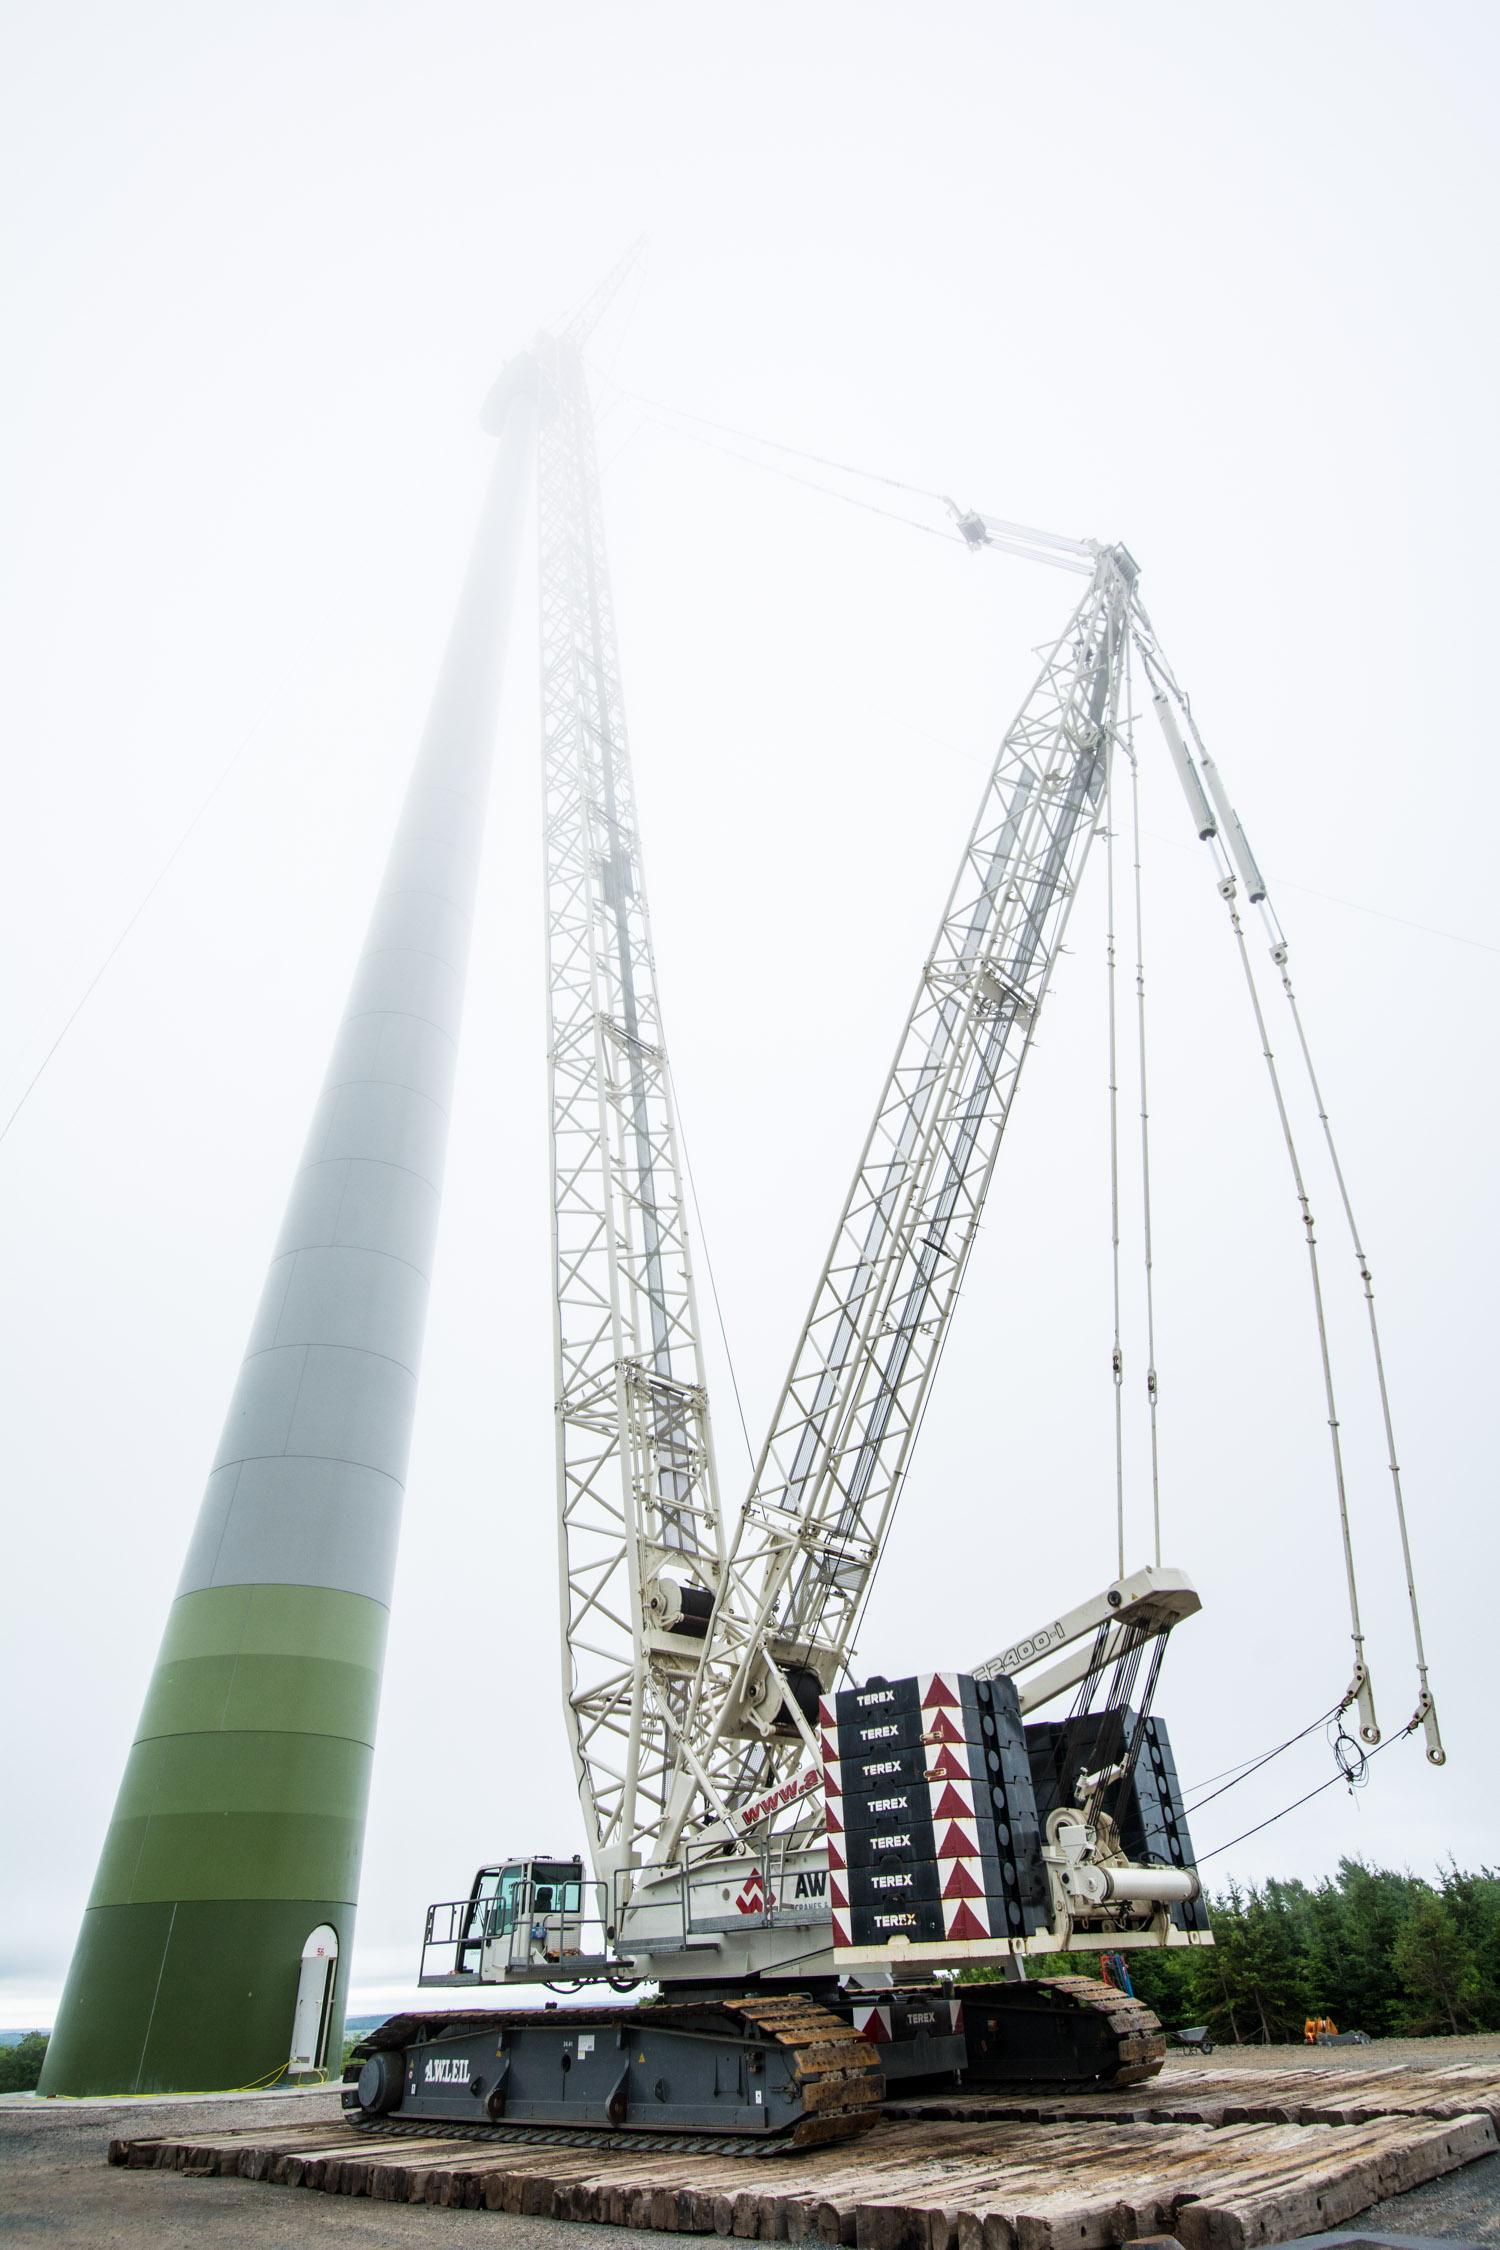 Wind Turbine Lift in Fog